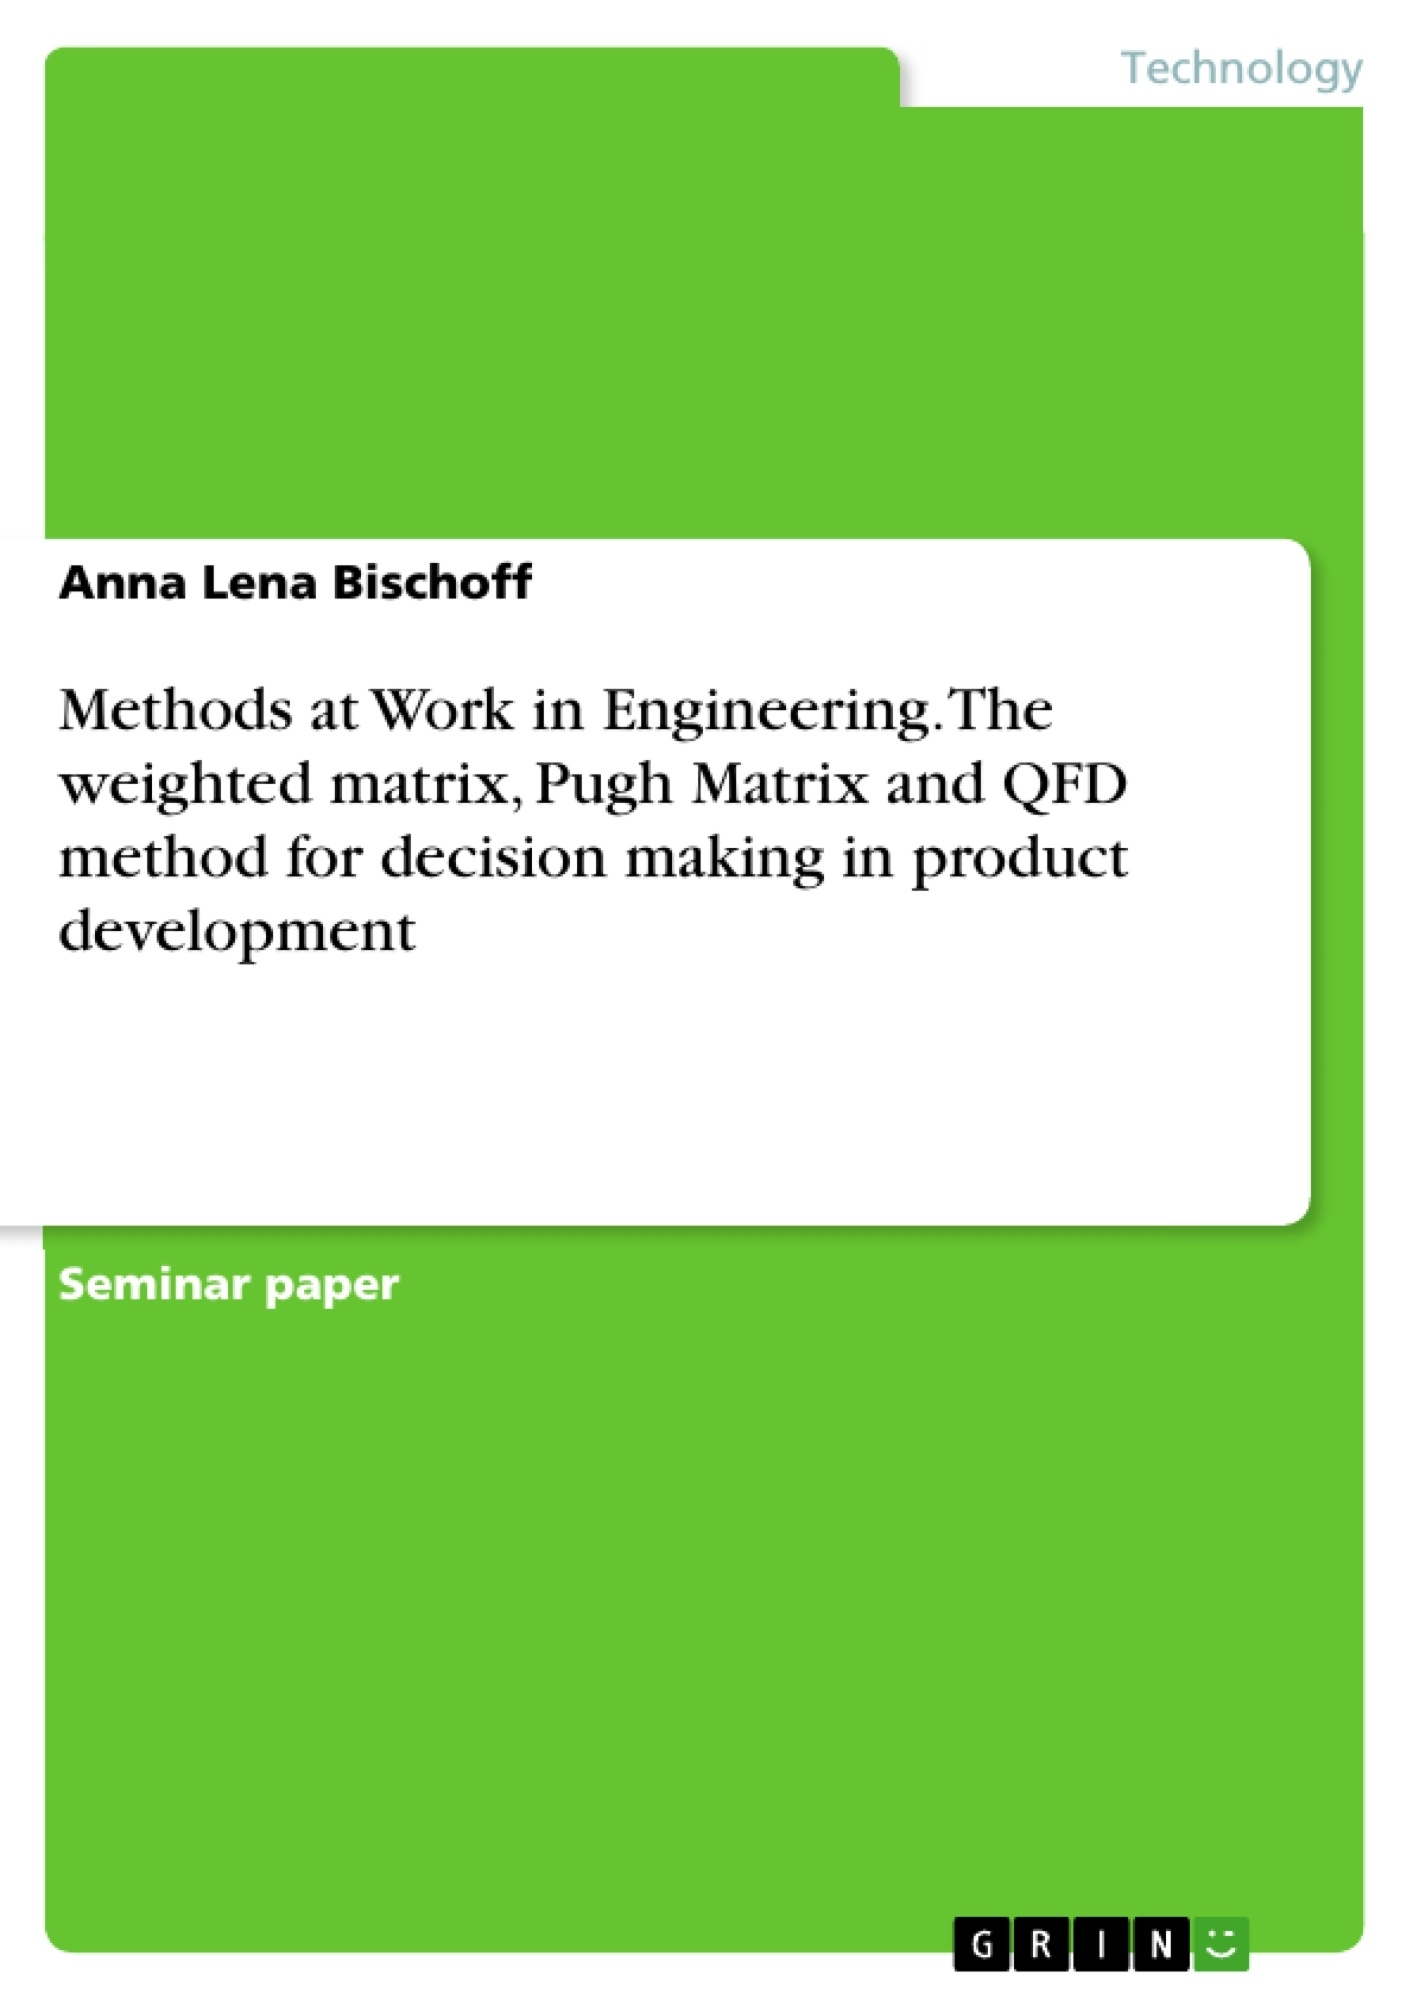 Business dissertation topic quantitative finance